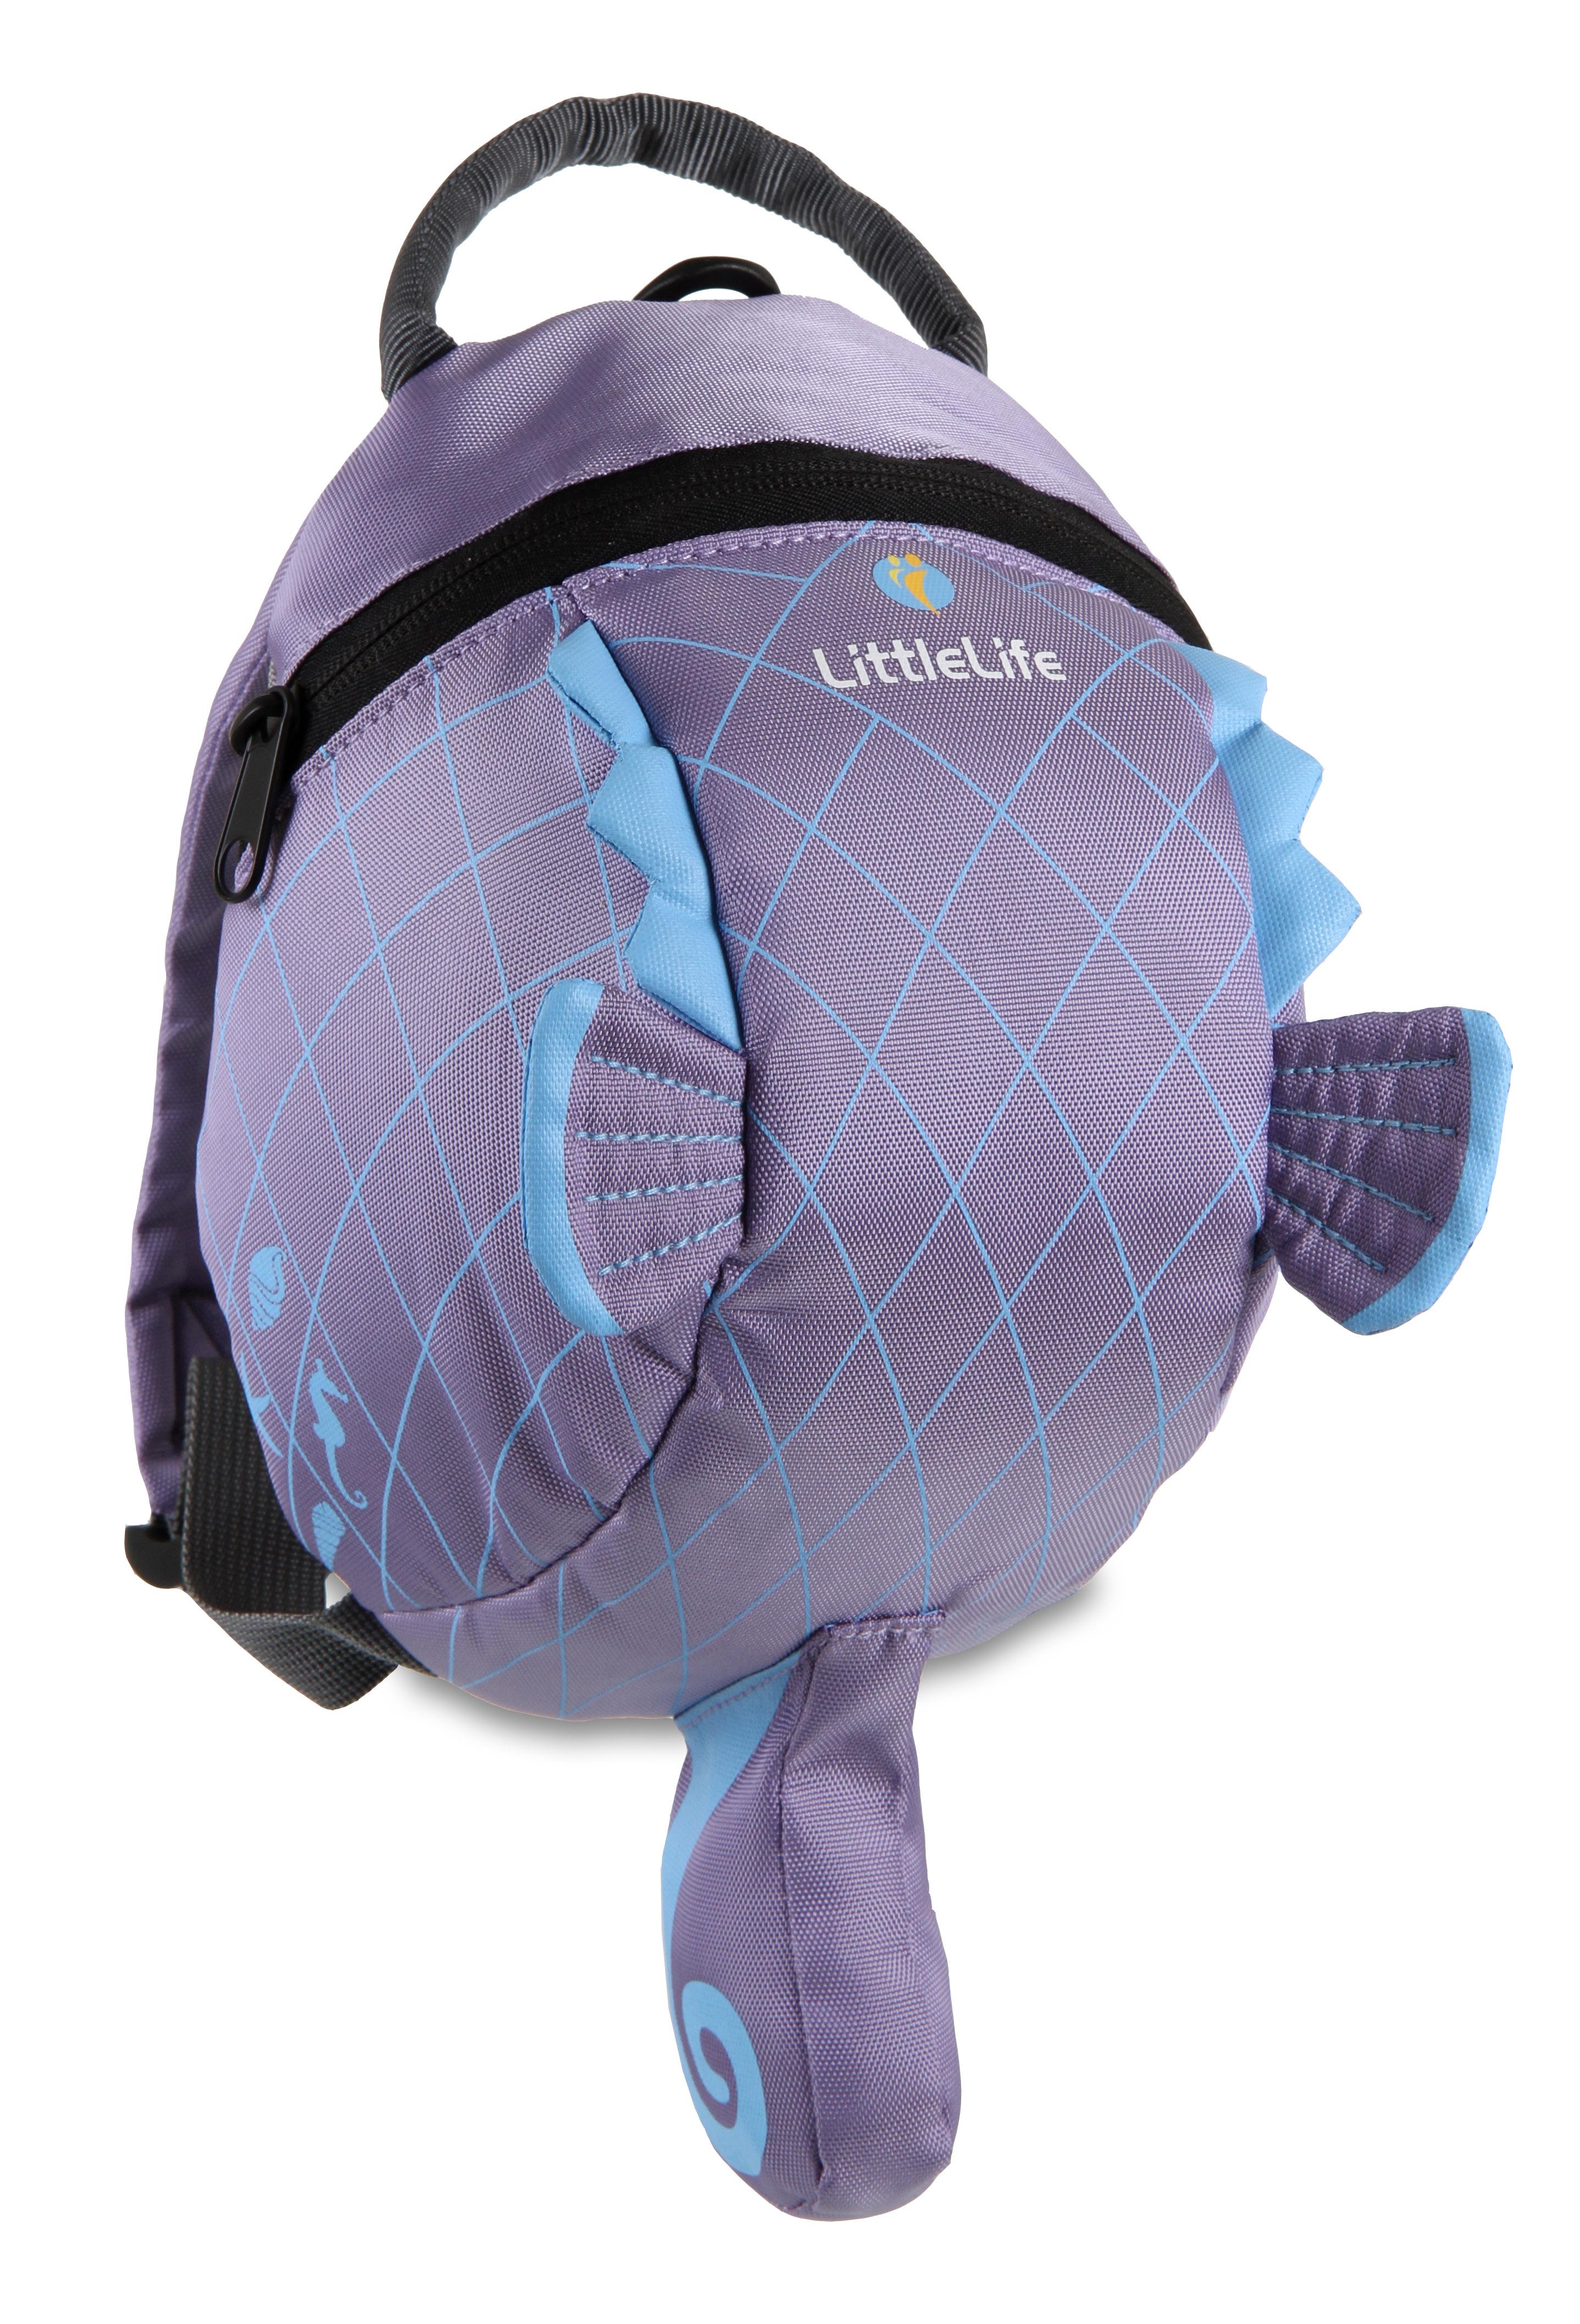 L10890 Animal Daysack - Seahorse